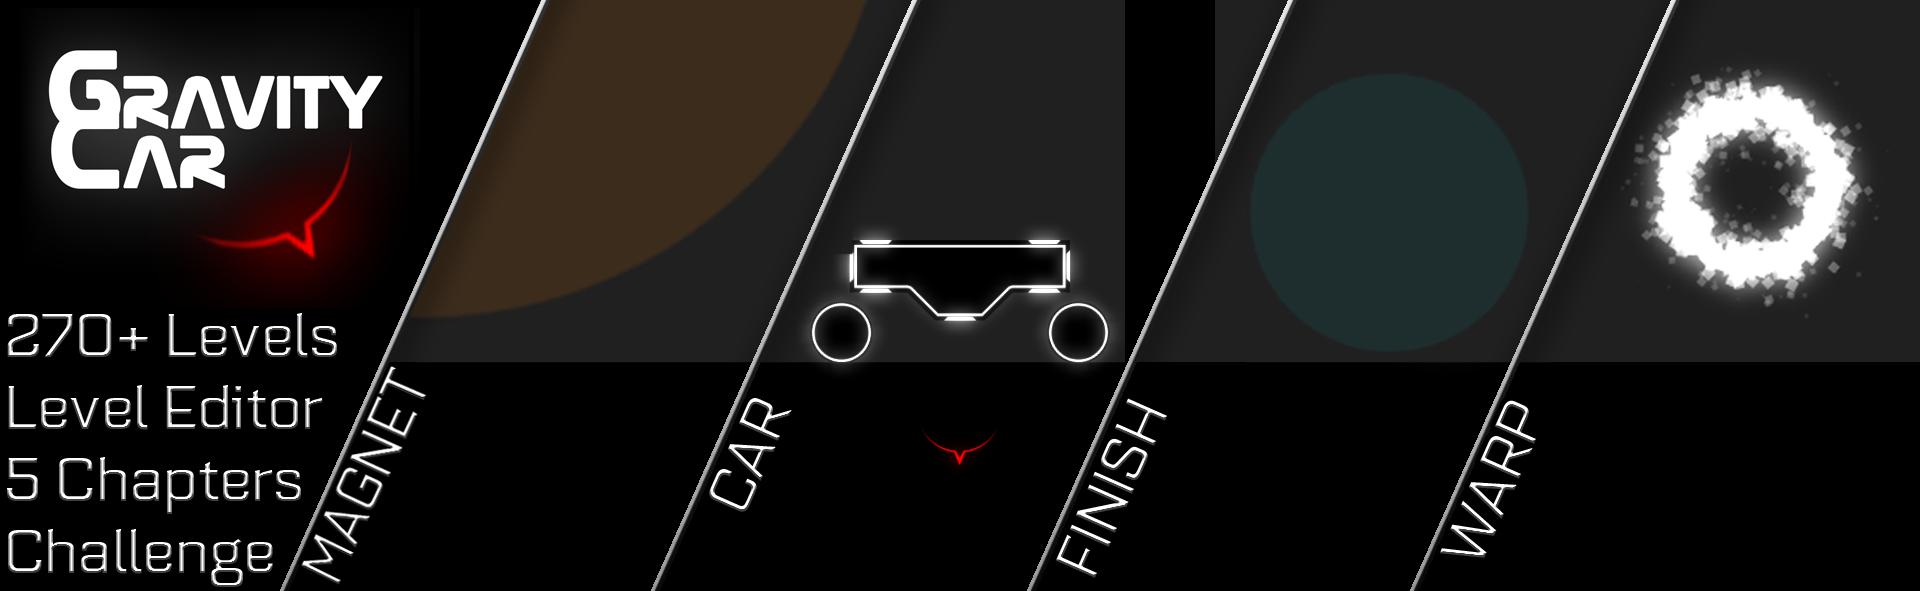 Gravity Car